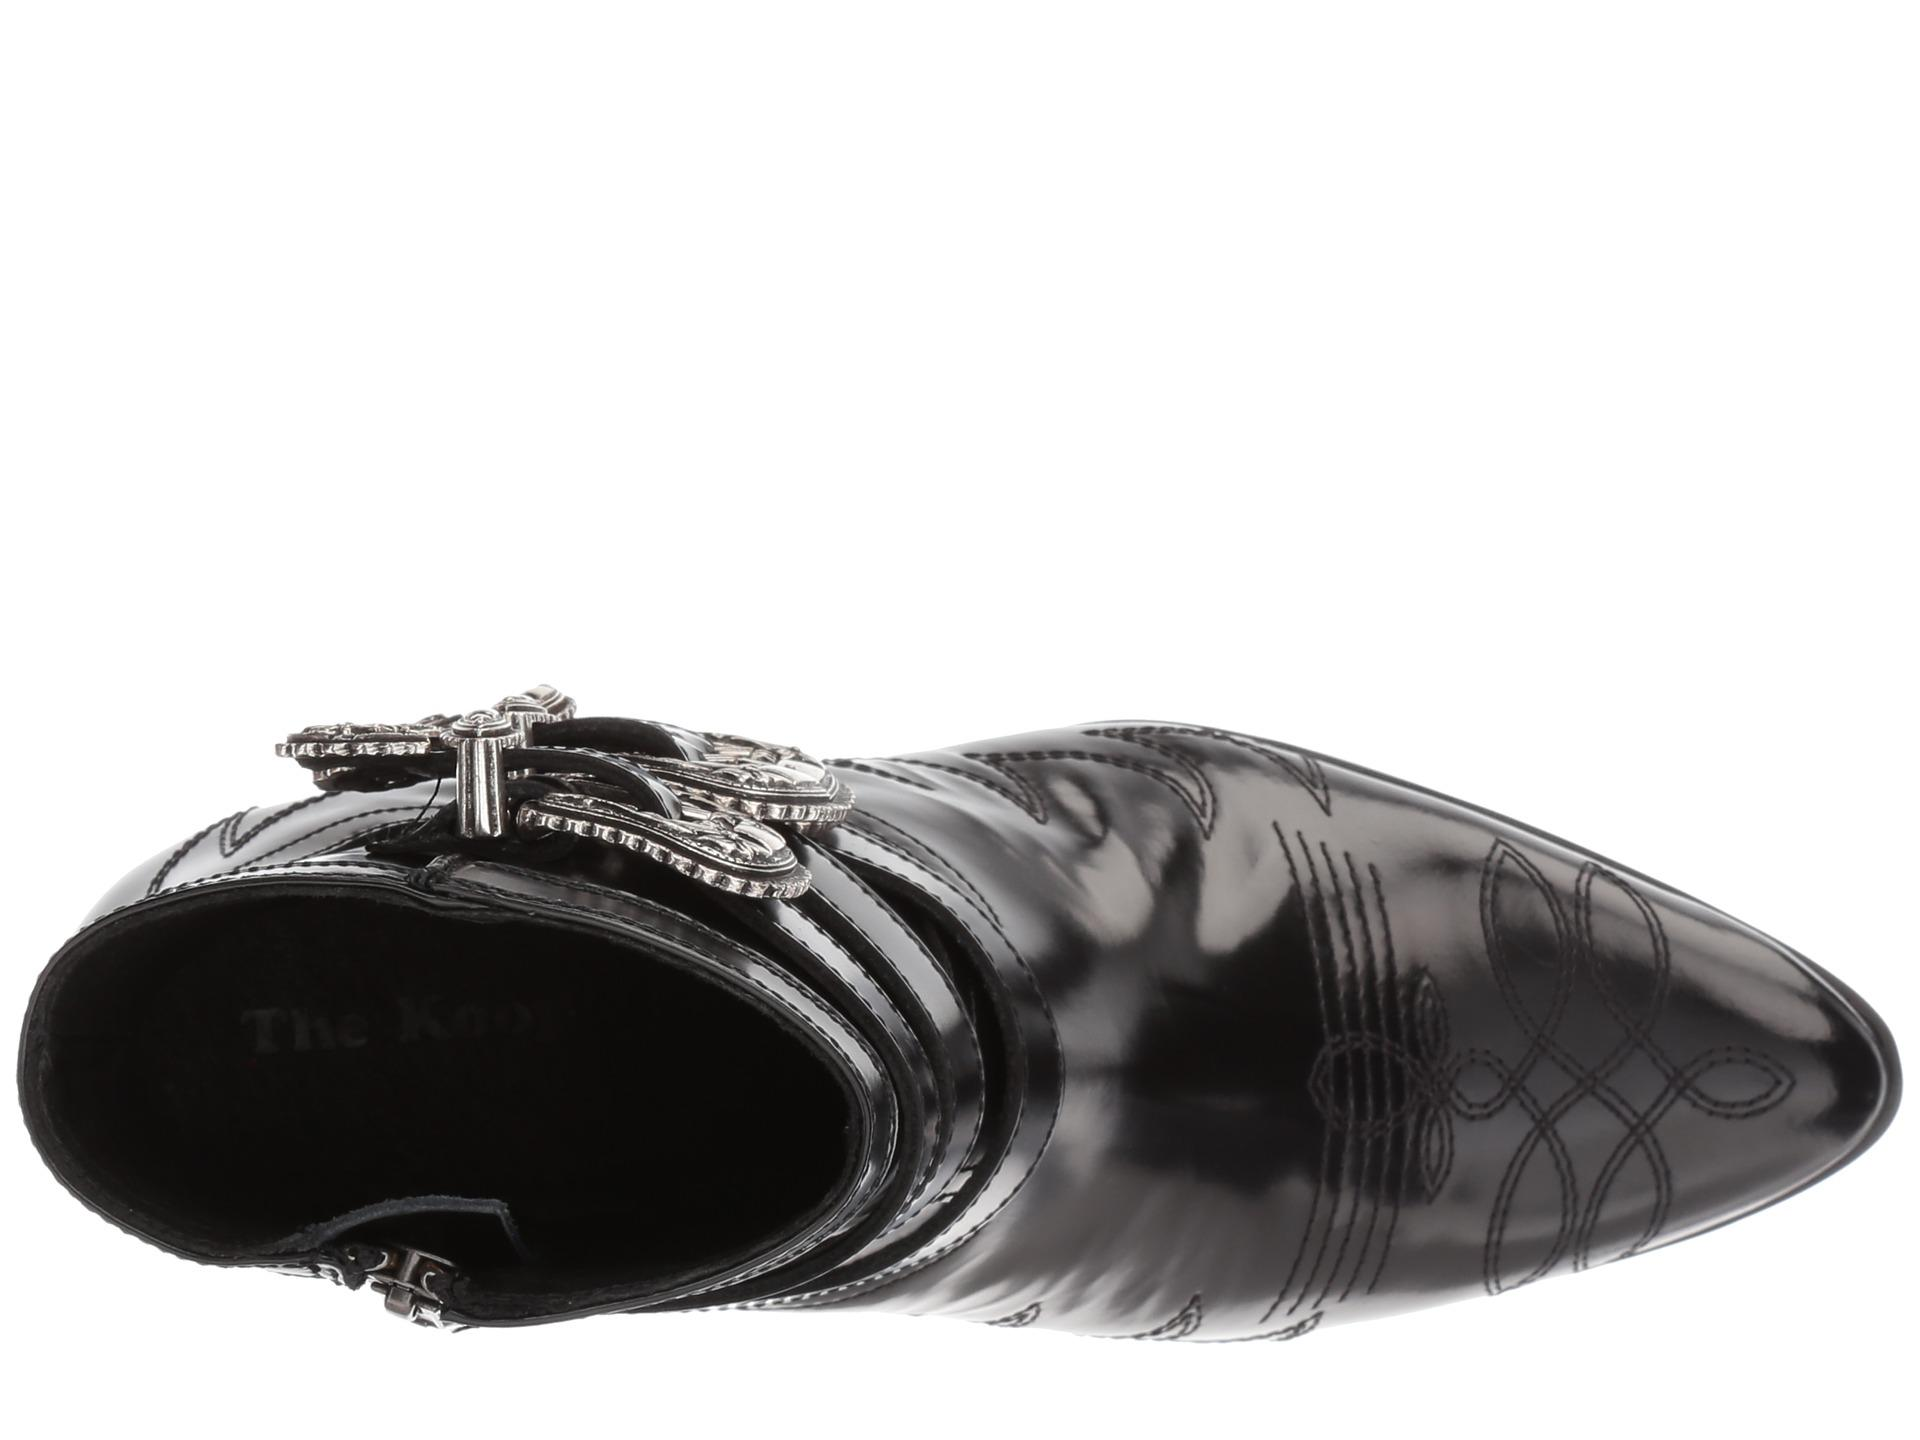 5a9592e24cc The Kooples Black Leather Cowboy Boots